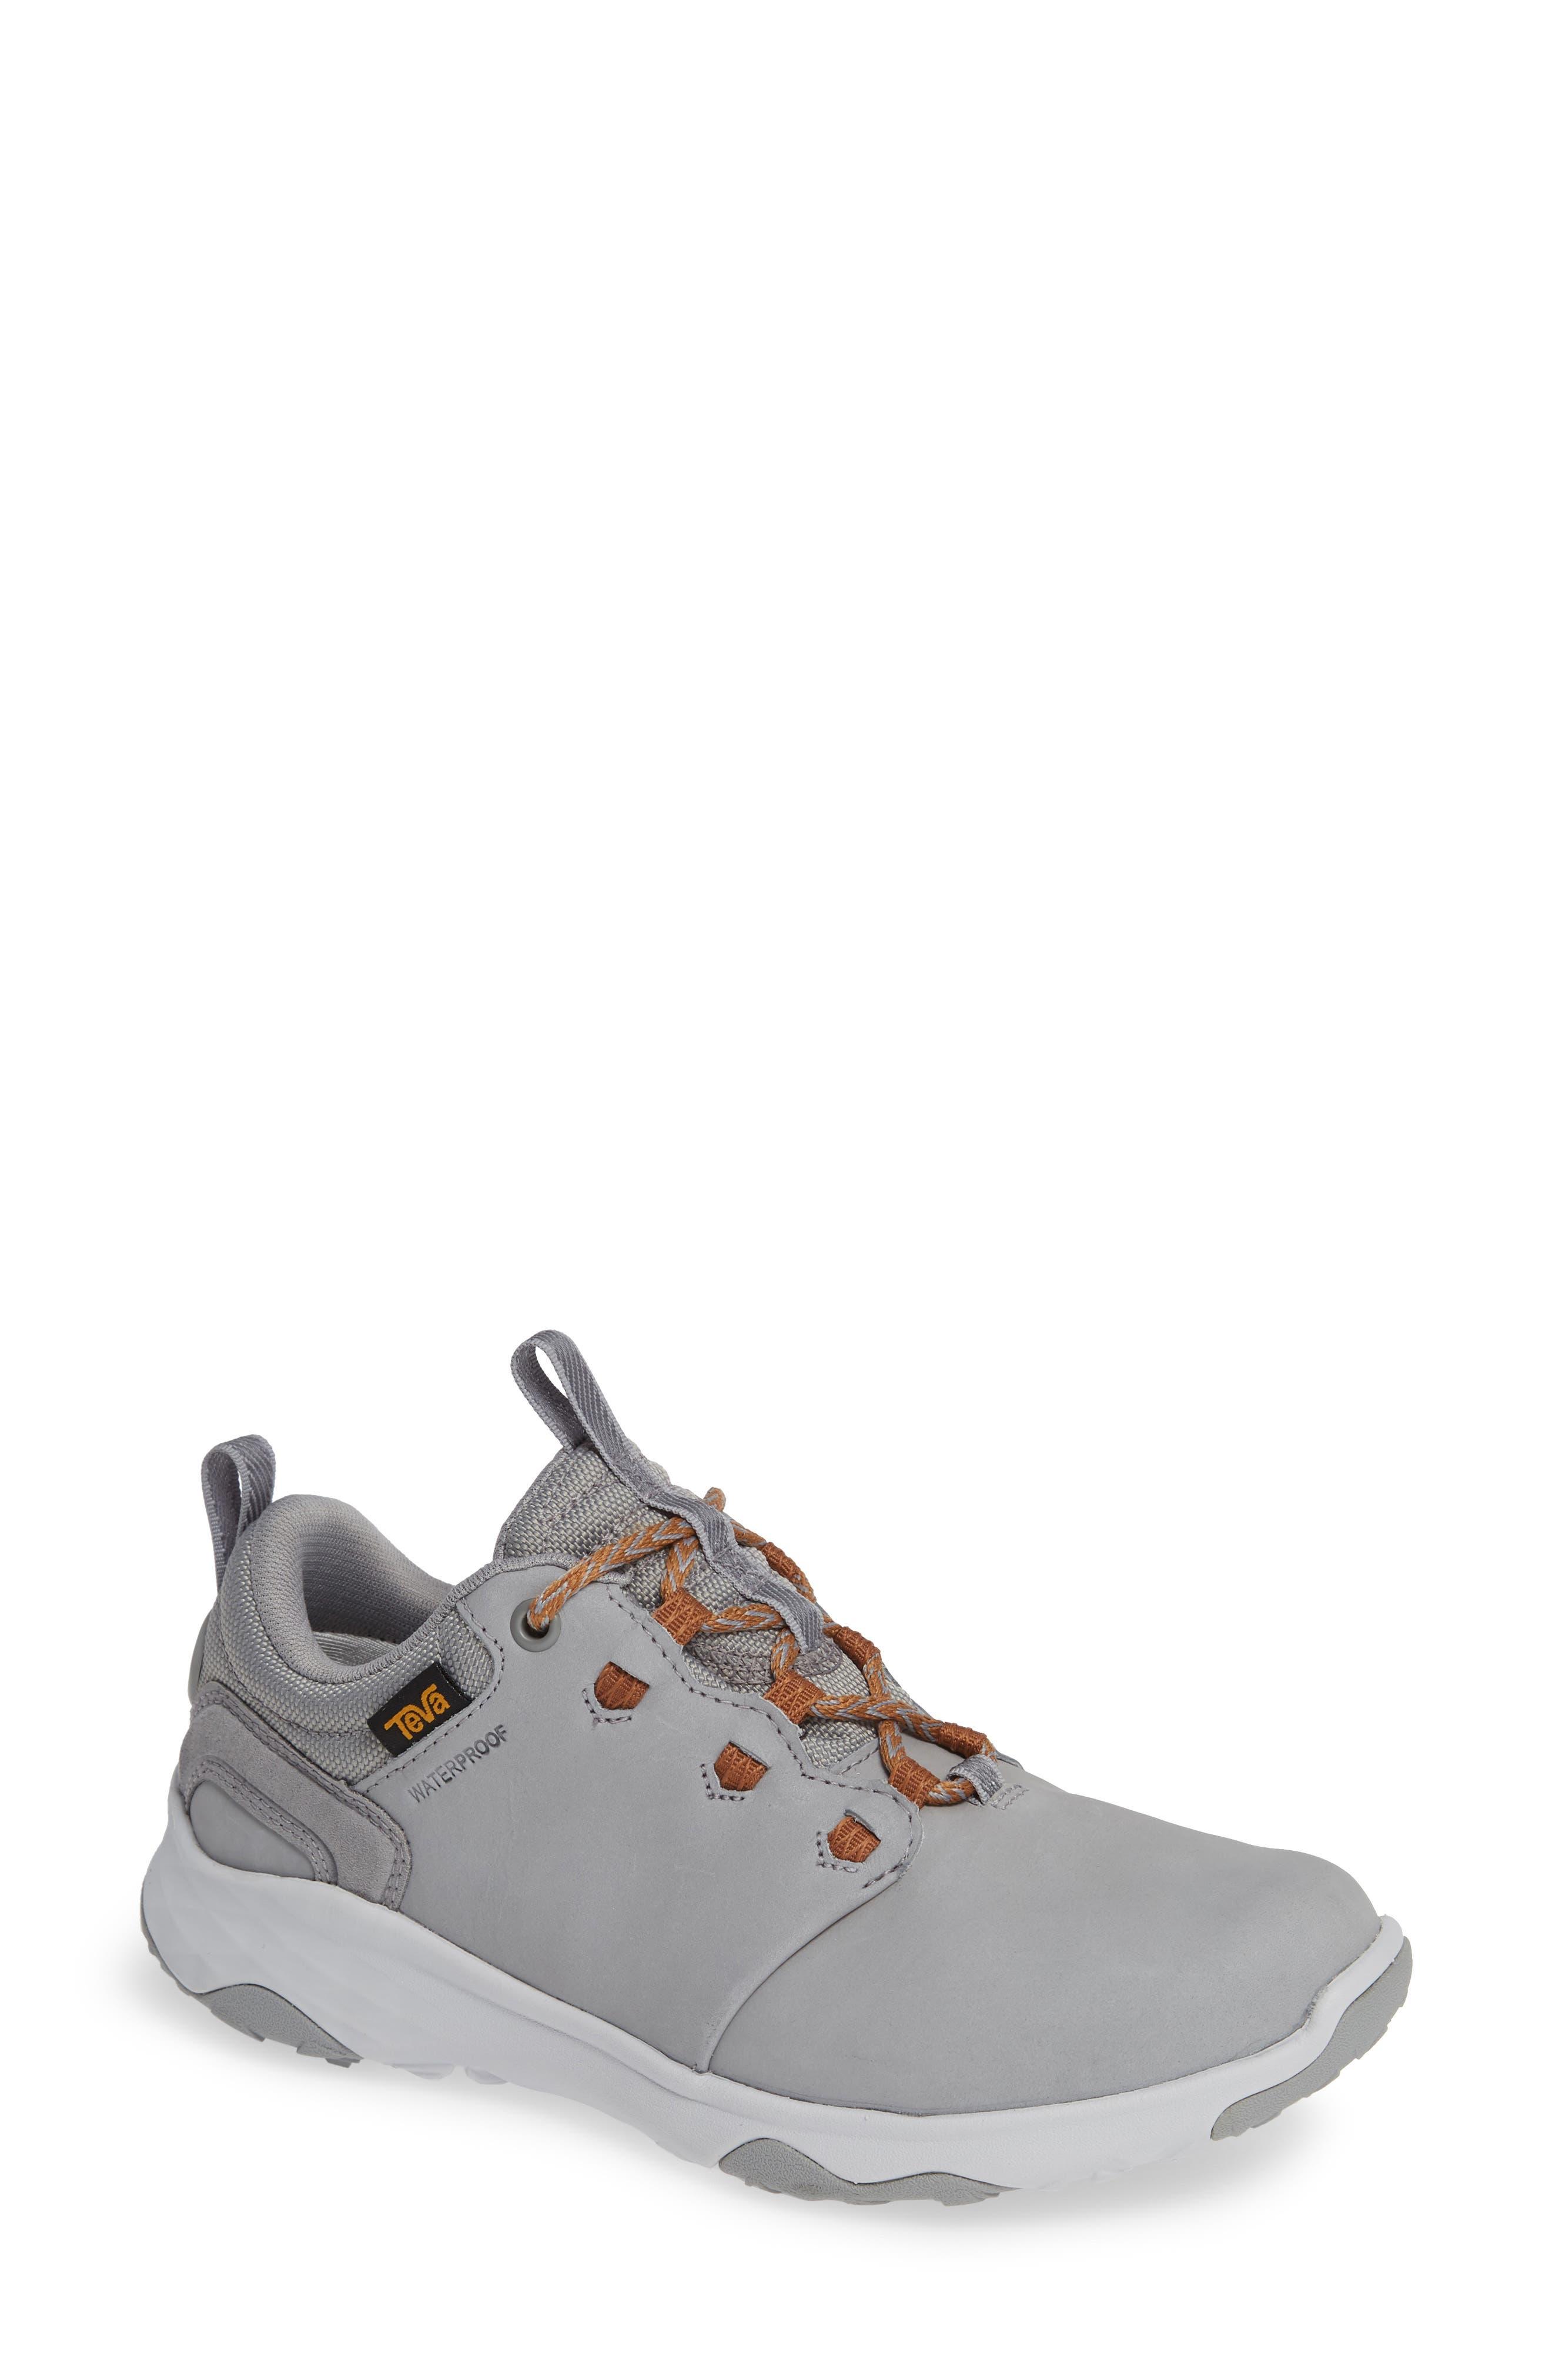 'Arrowood' Waterproof Sneaker,                         Main,                         color, WILD DOVE LEATHER